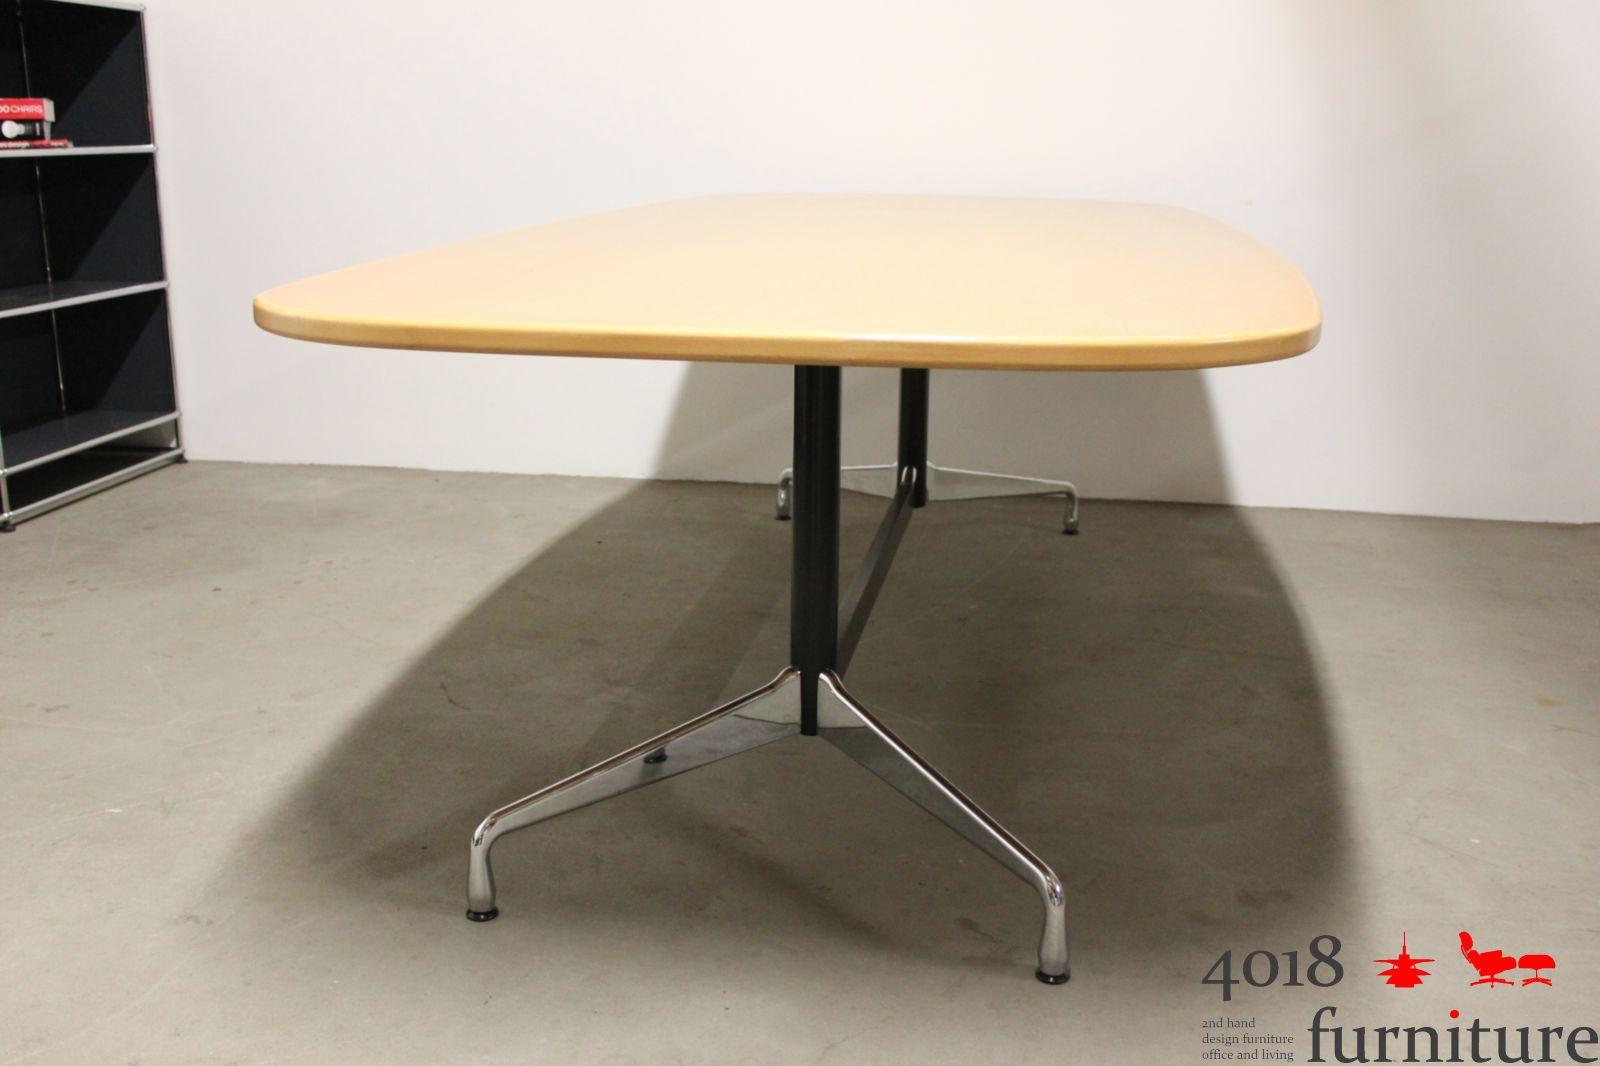 vitra charles eames segmented table buche bootsform 240 x 120 cm ebay. Black Bedroom Furniture Sets. Home Design Ideas